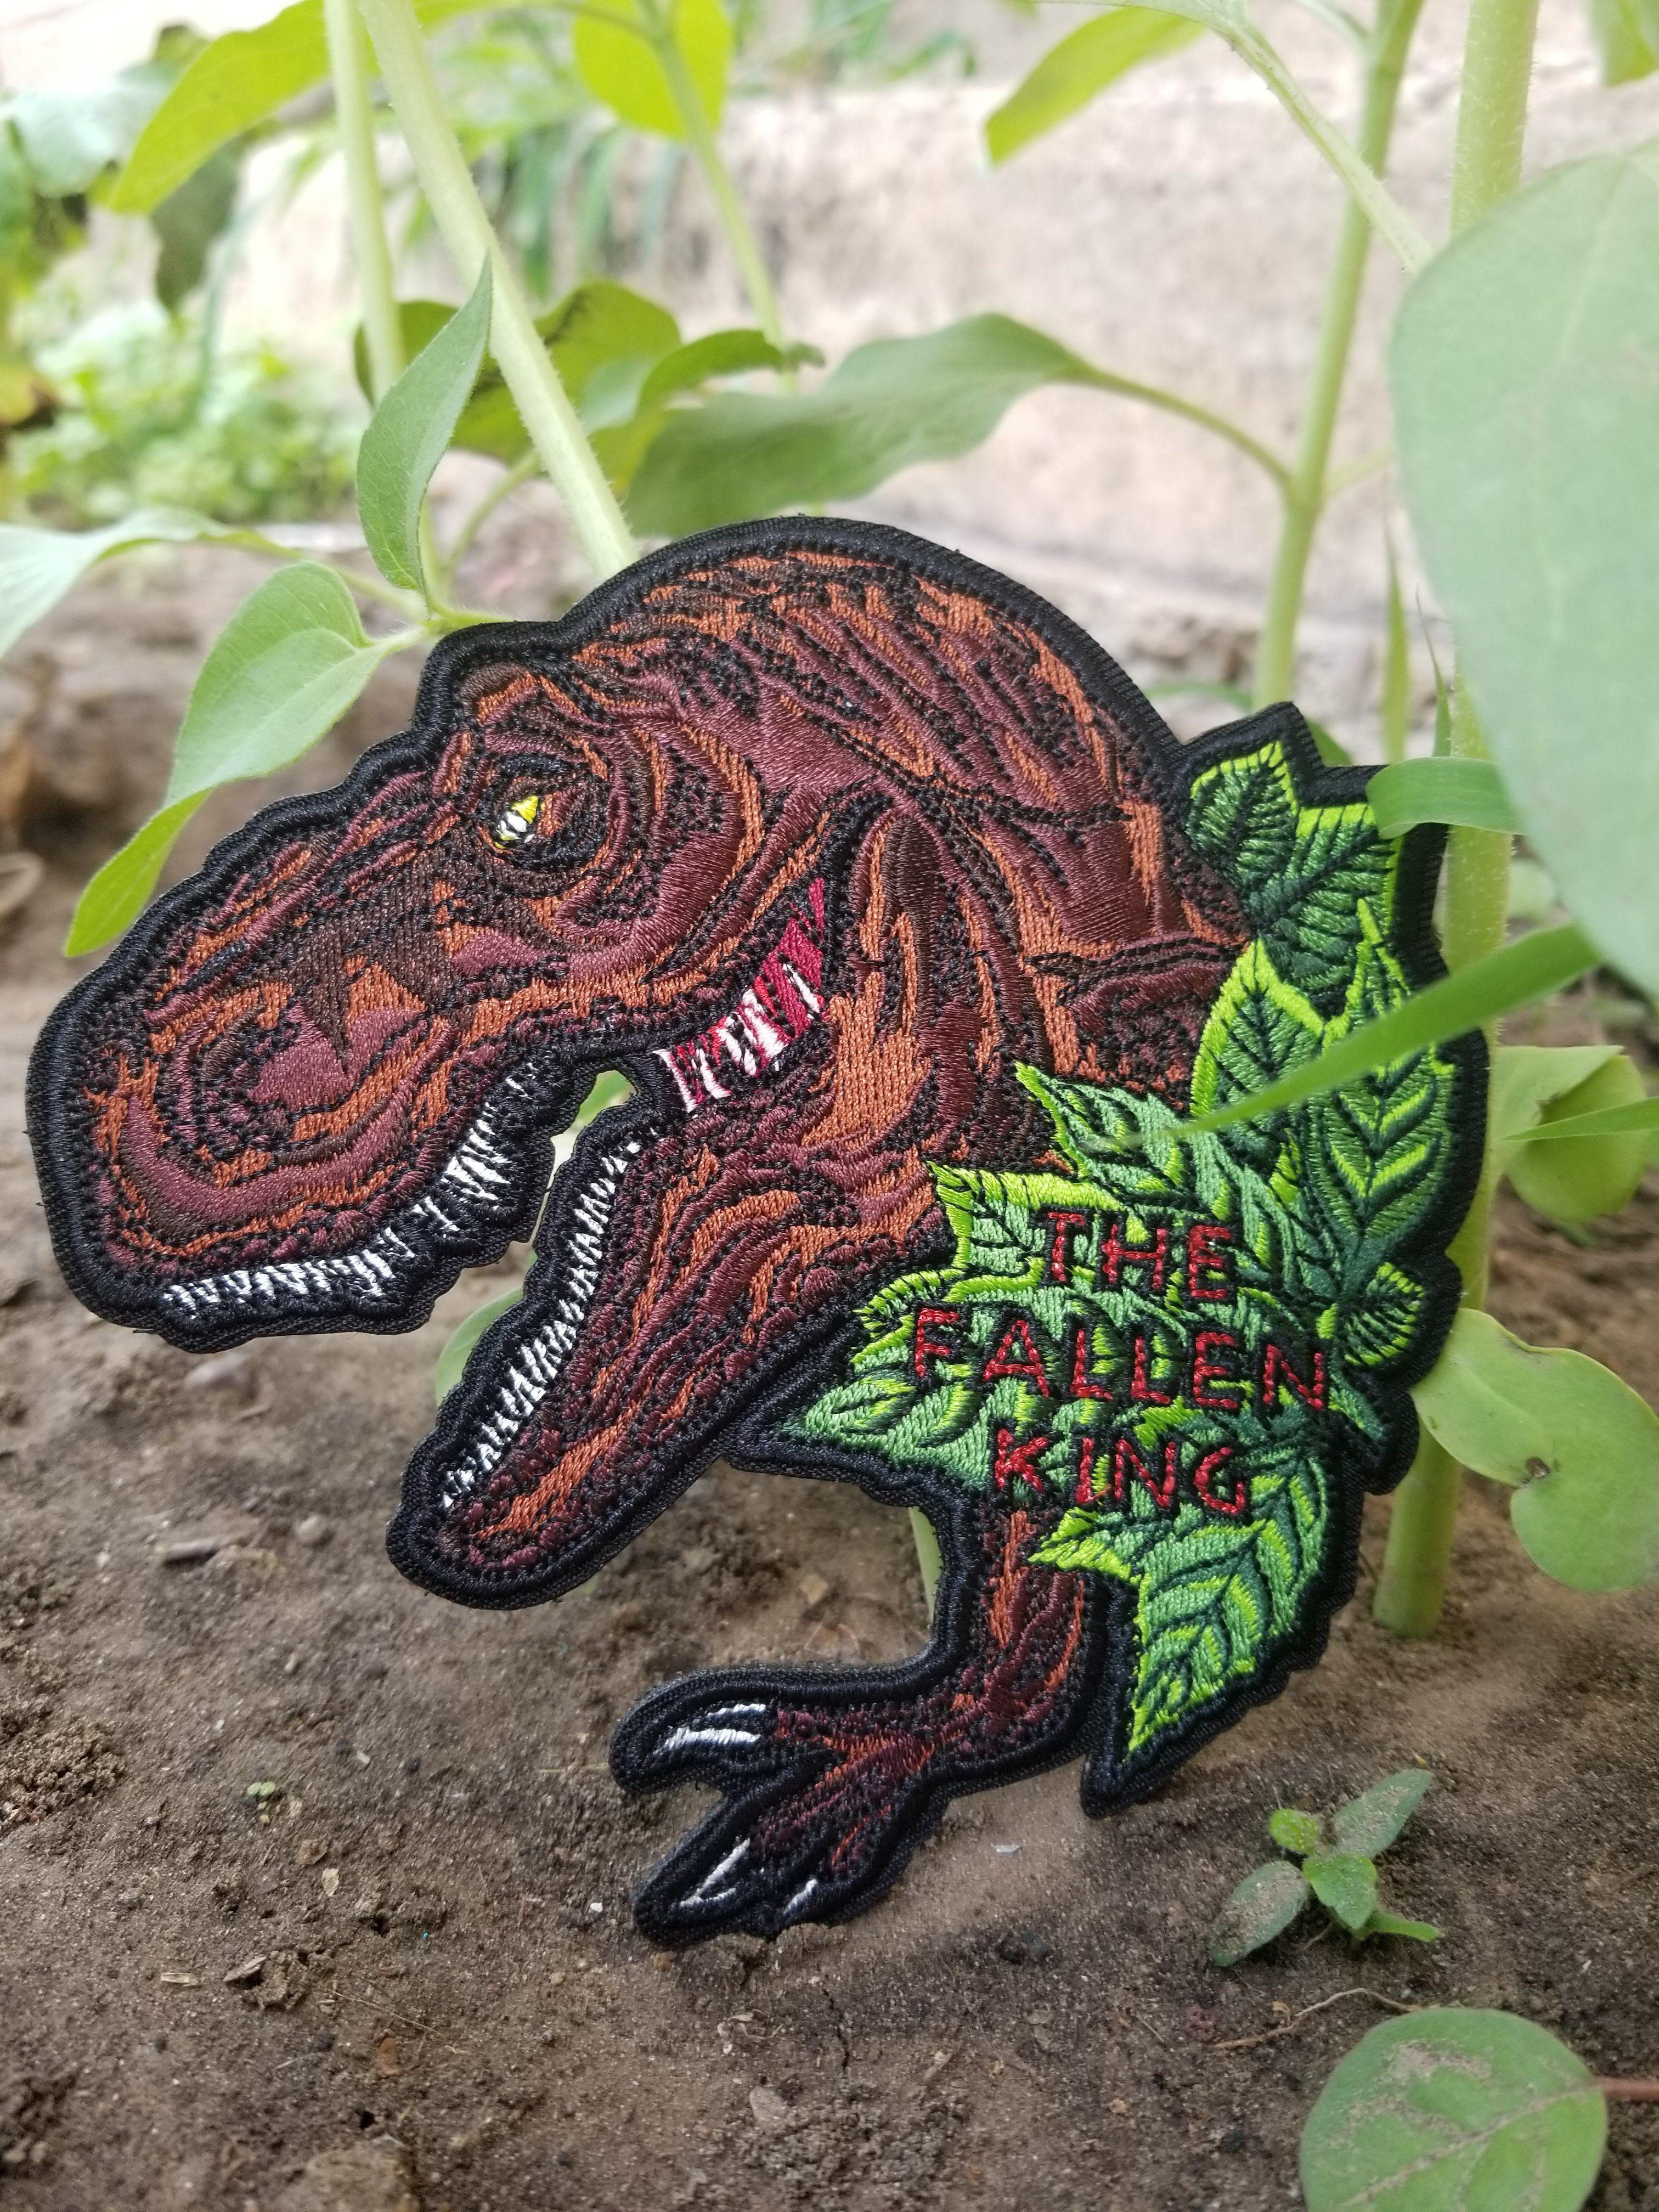 Museum T-Rex Science Dinosaur Iron On Applique Patch